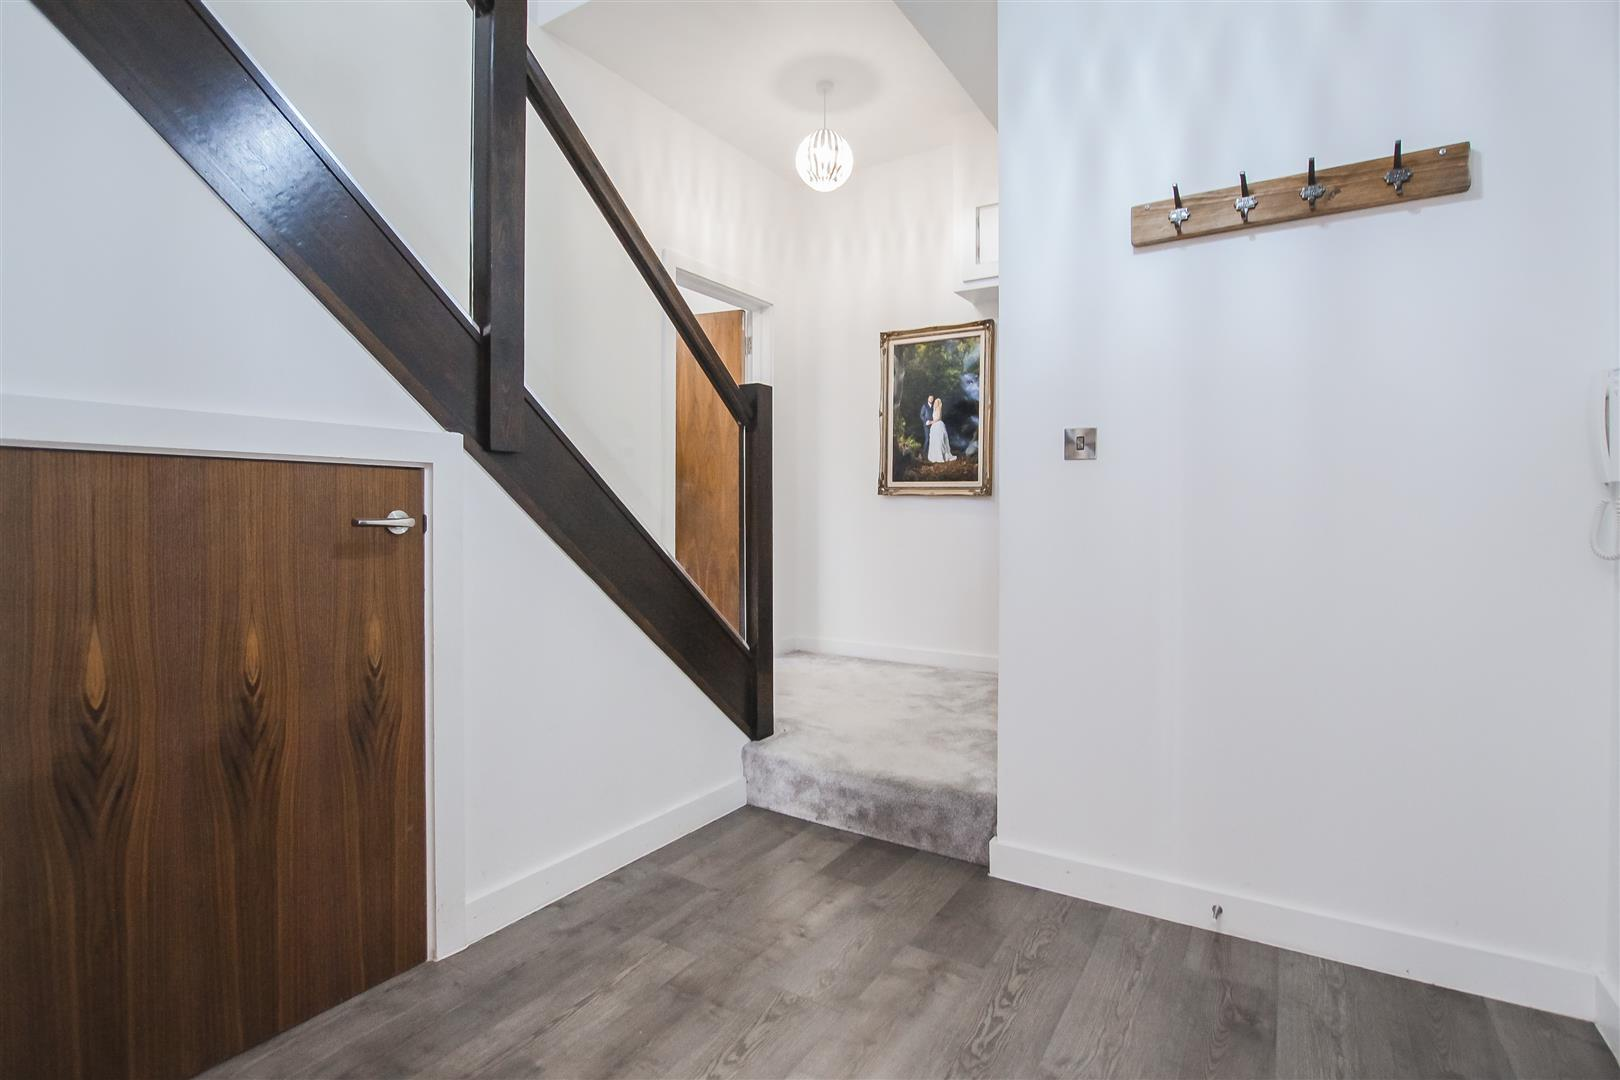 3 Bedroom Duplex Apartment For Sale - Image 14